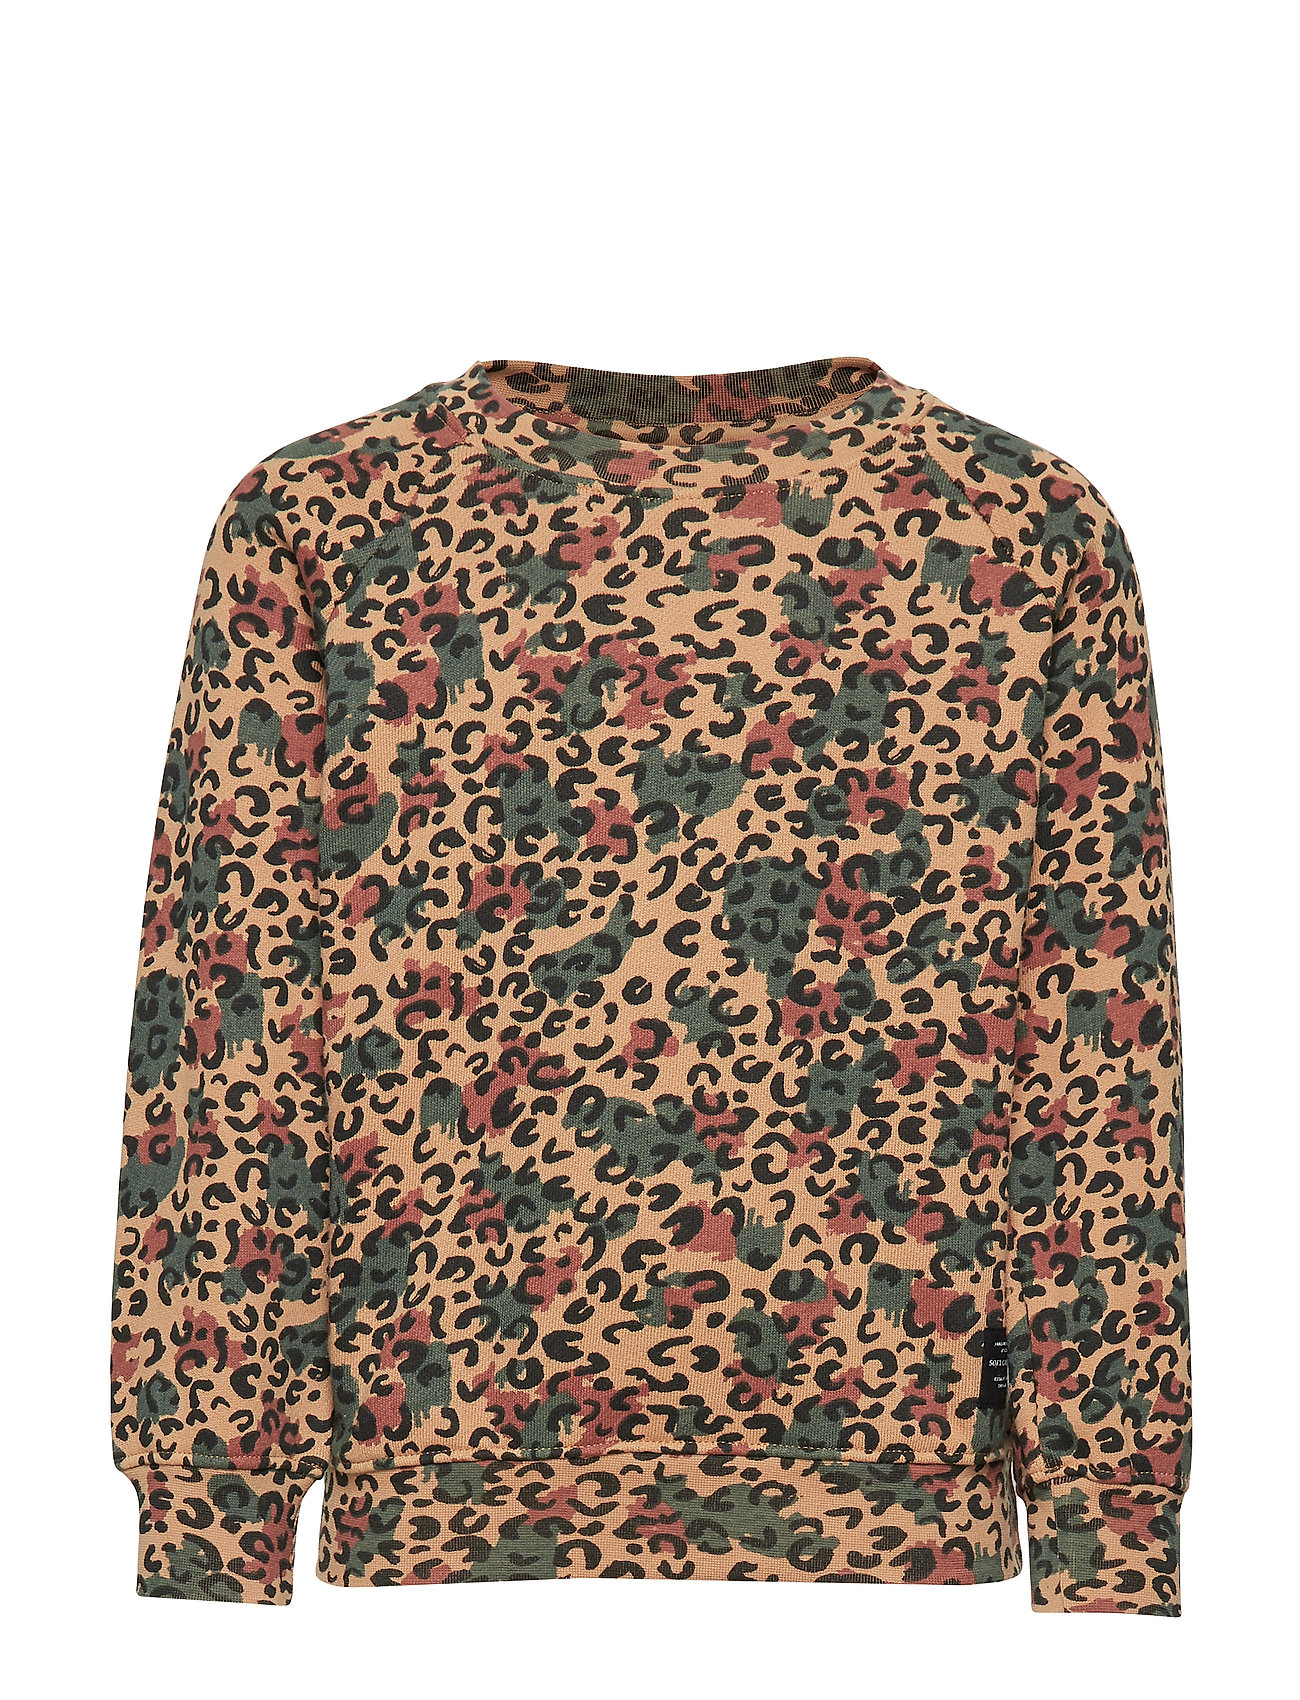 Soft Gallery Chaz Sweatshirt - DOE, AOP CAMOLEO